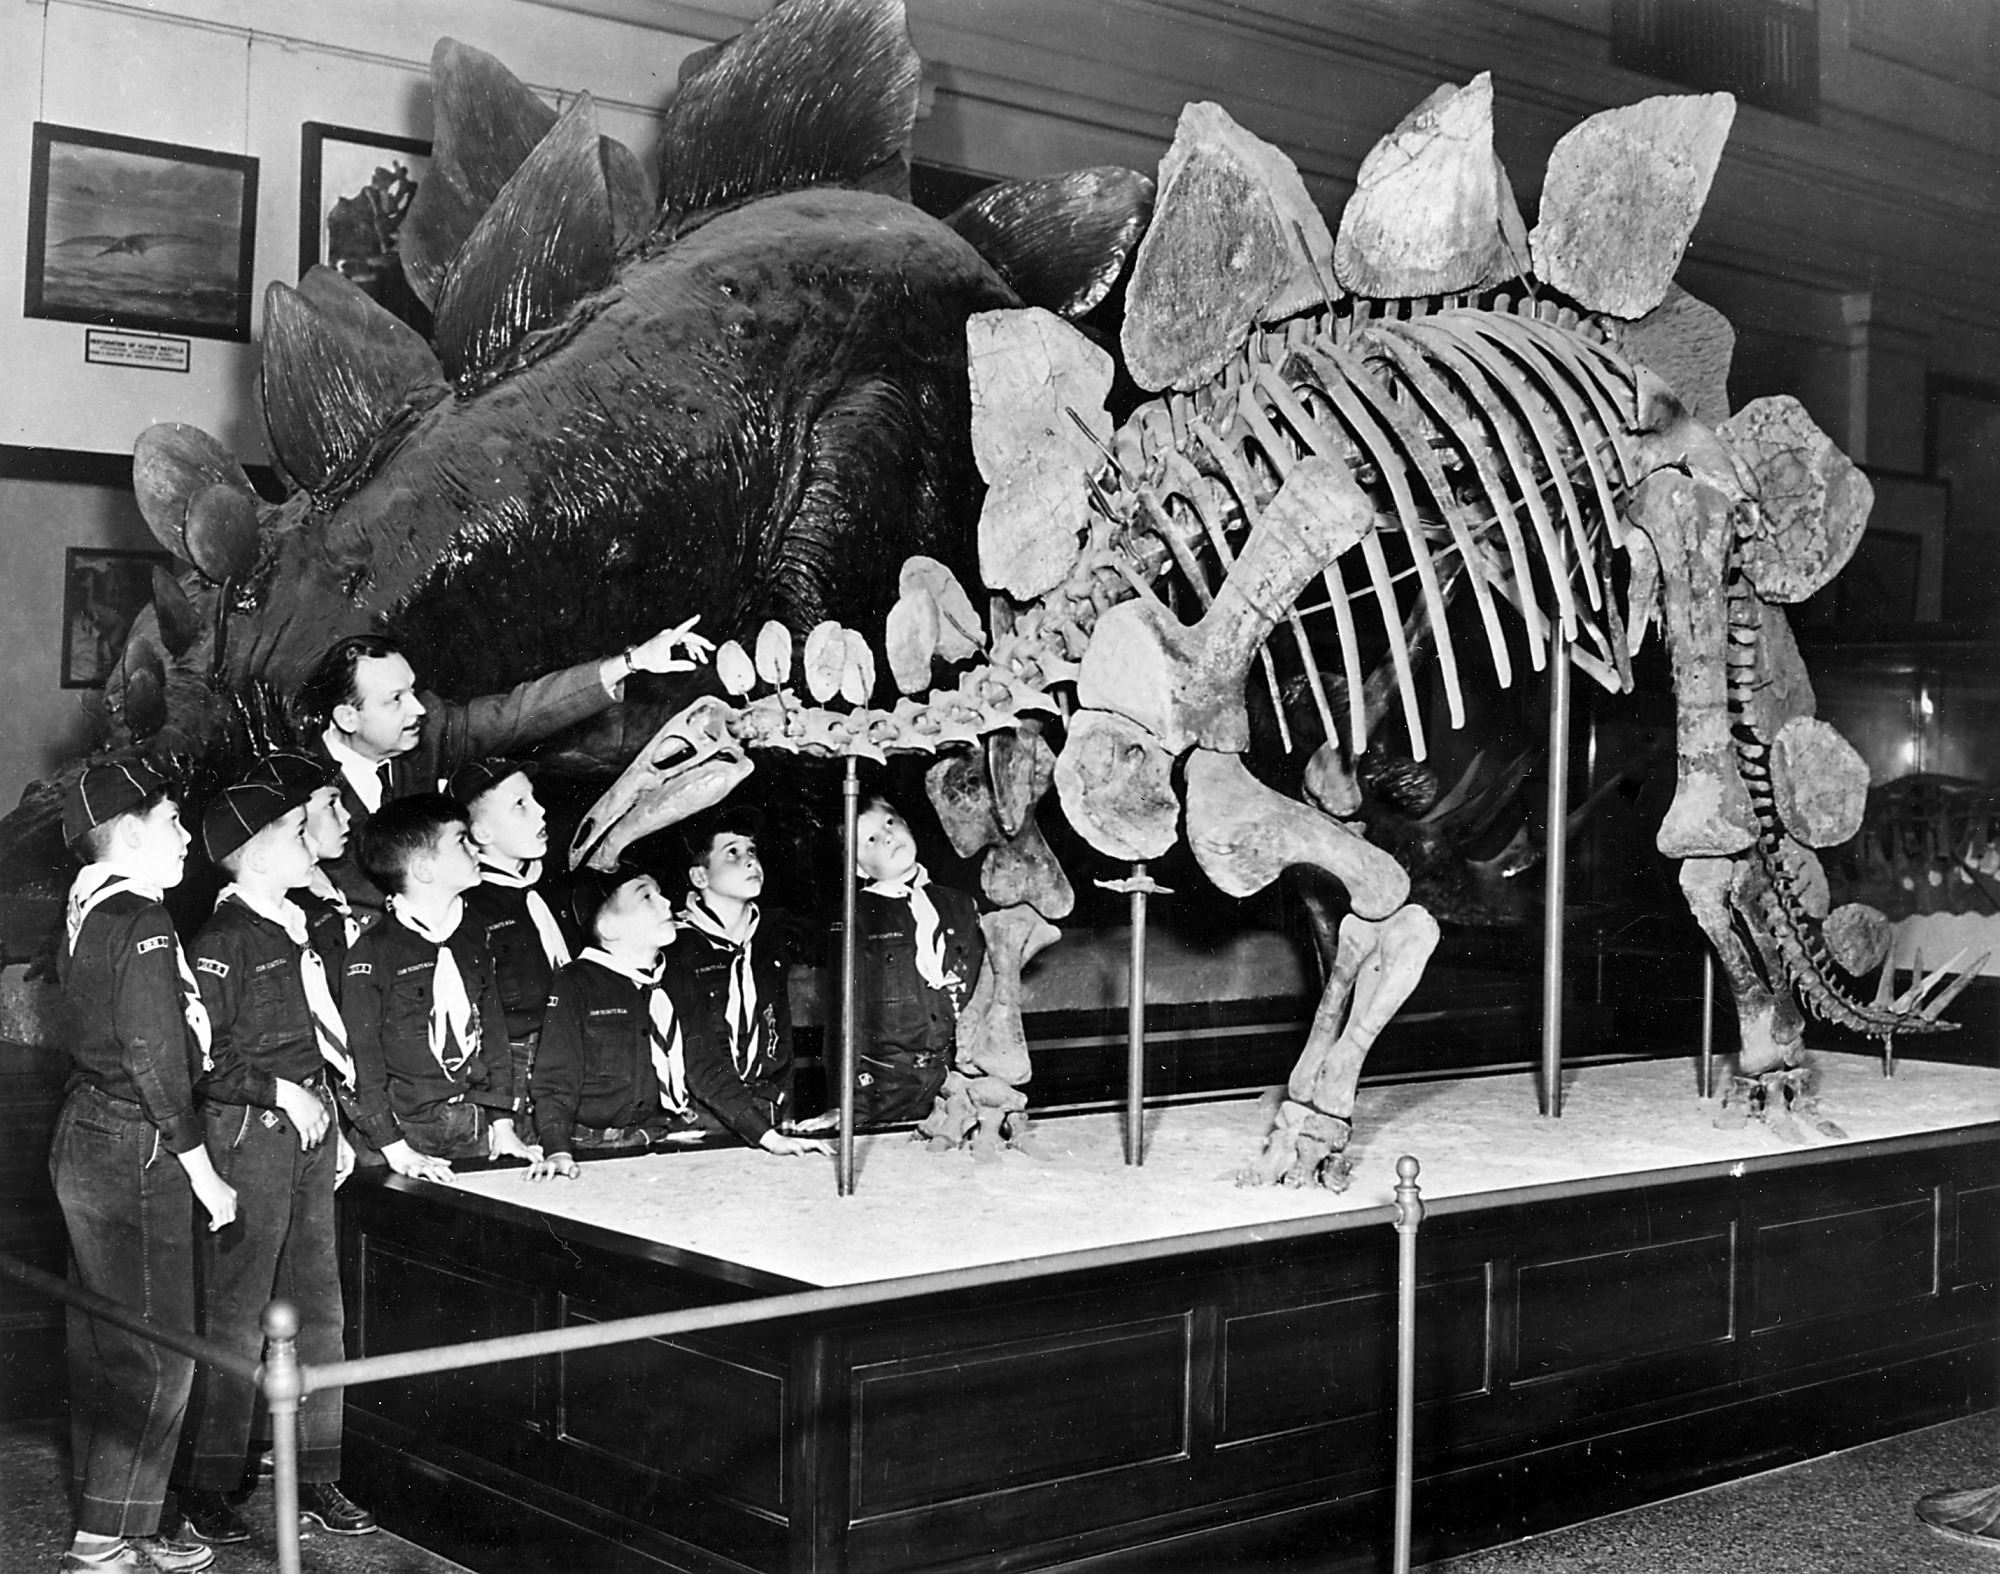 Cub Scouts View the Stegosaurus